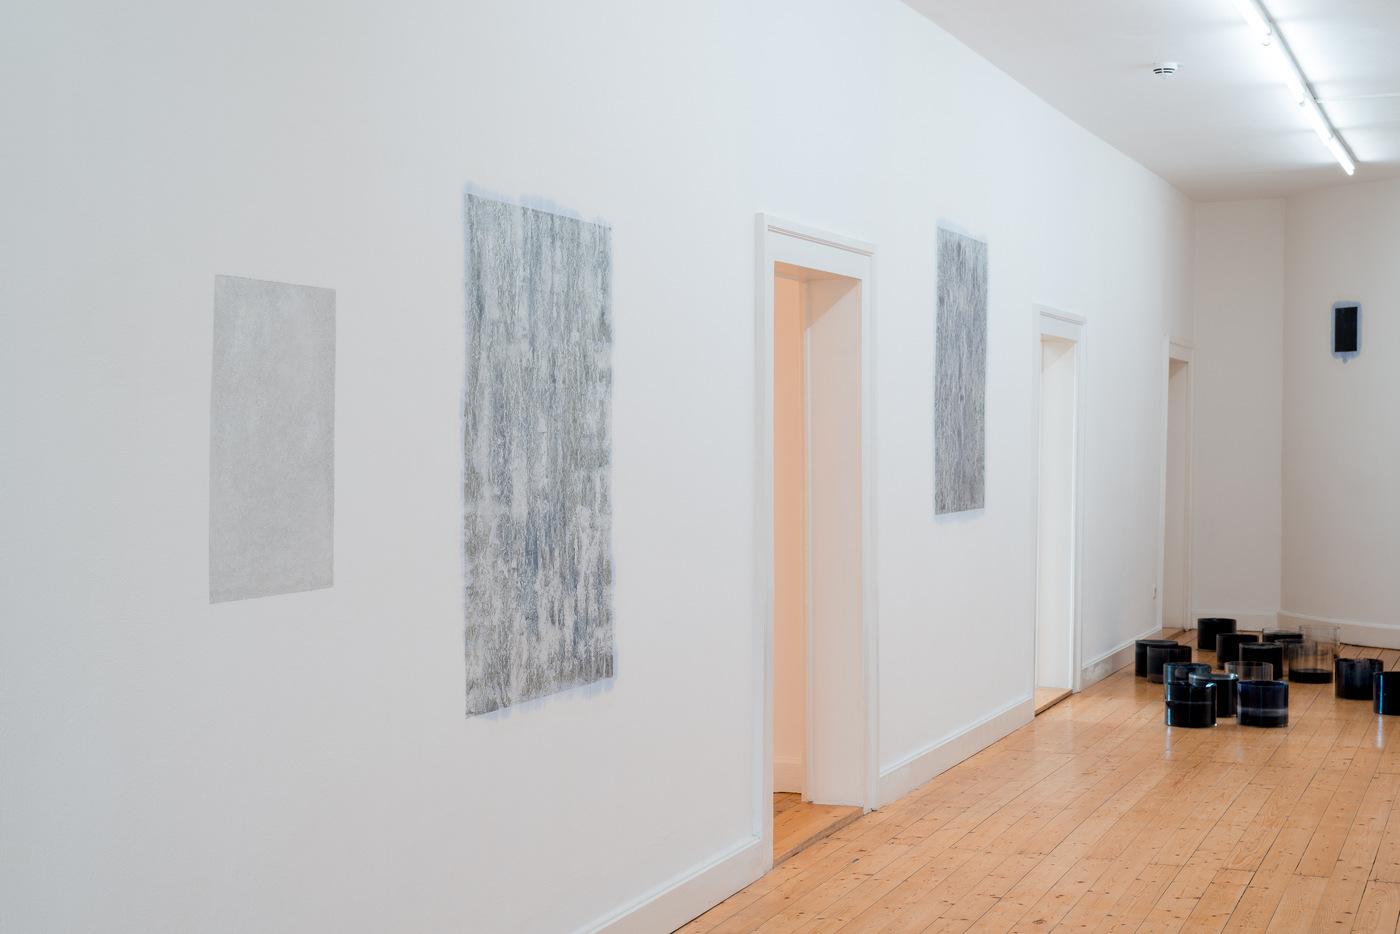 ProcessPerformancePresence_Kretschmann at Kunstverein Braunschweig 5